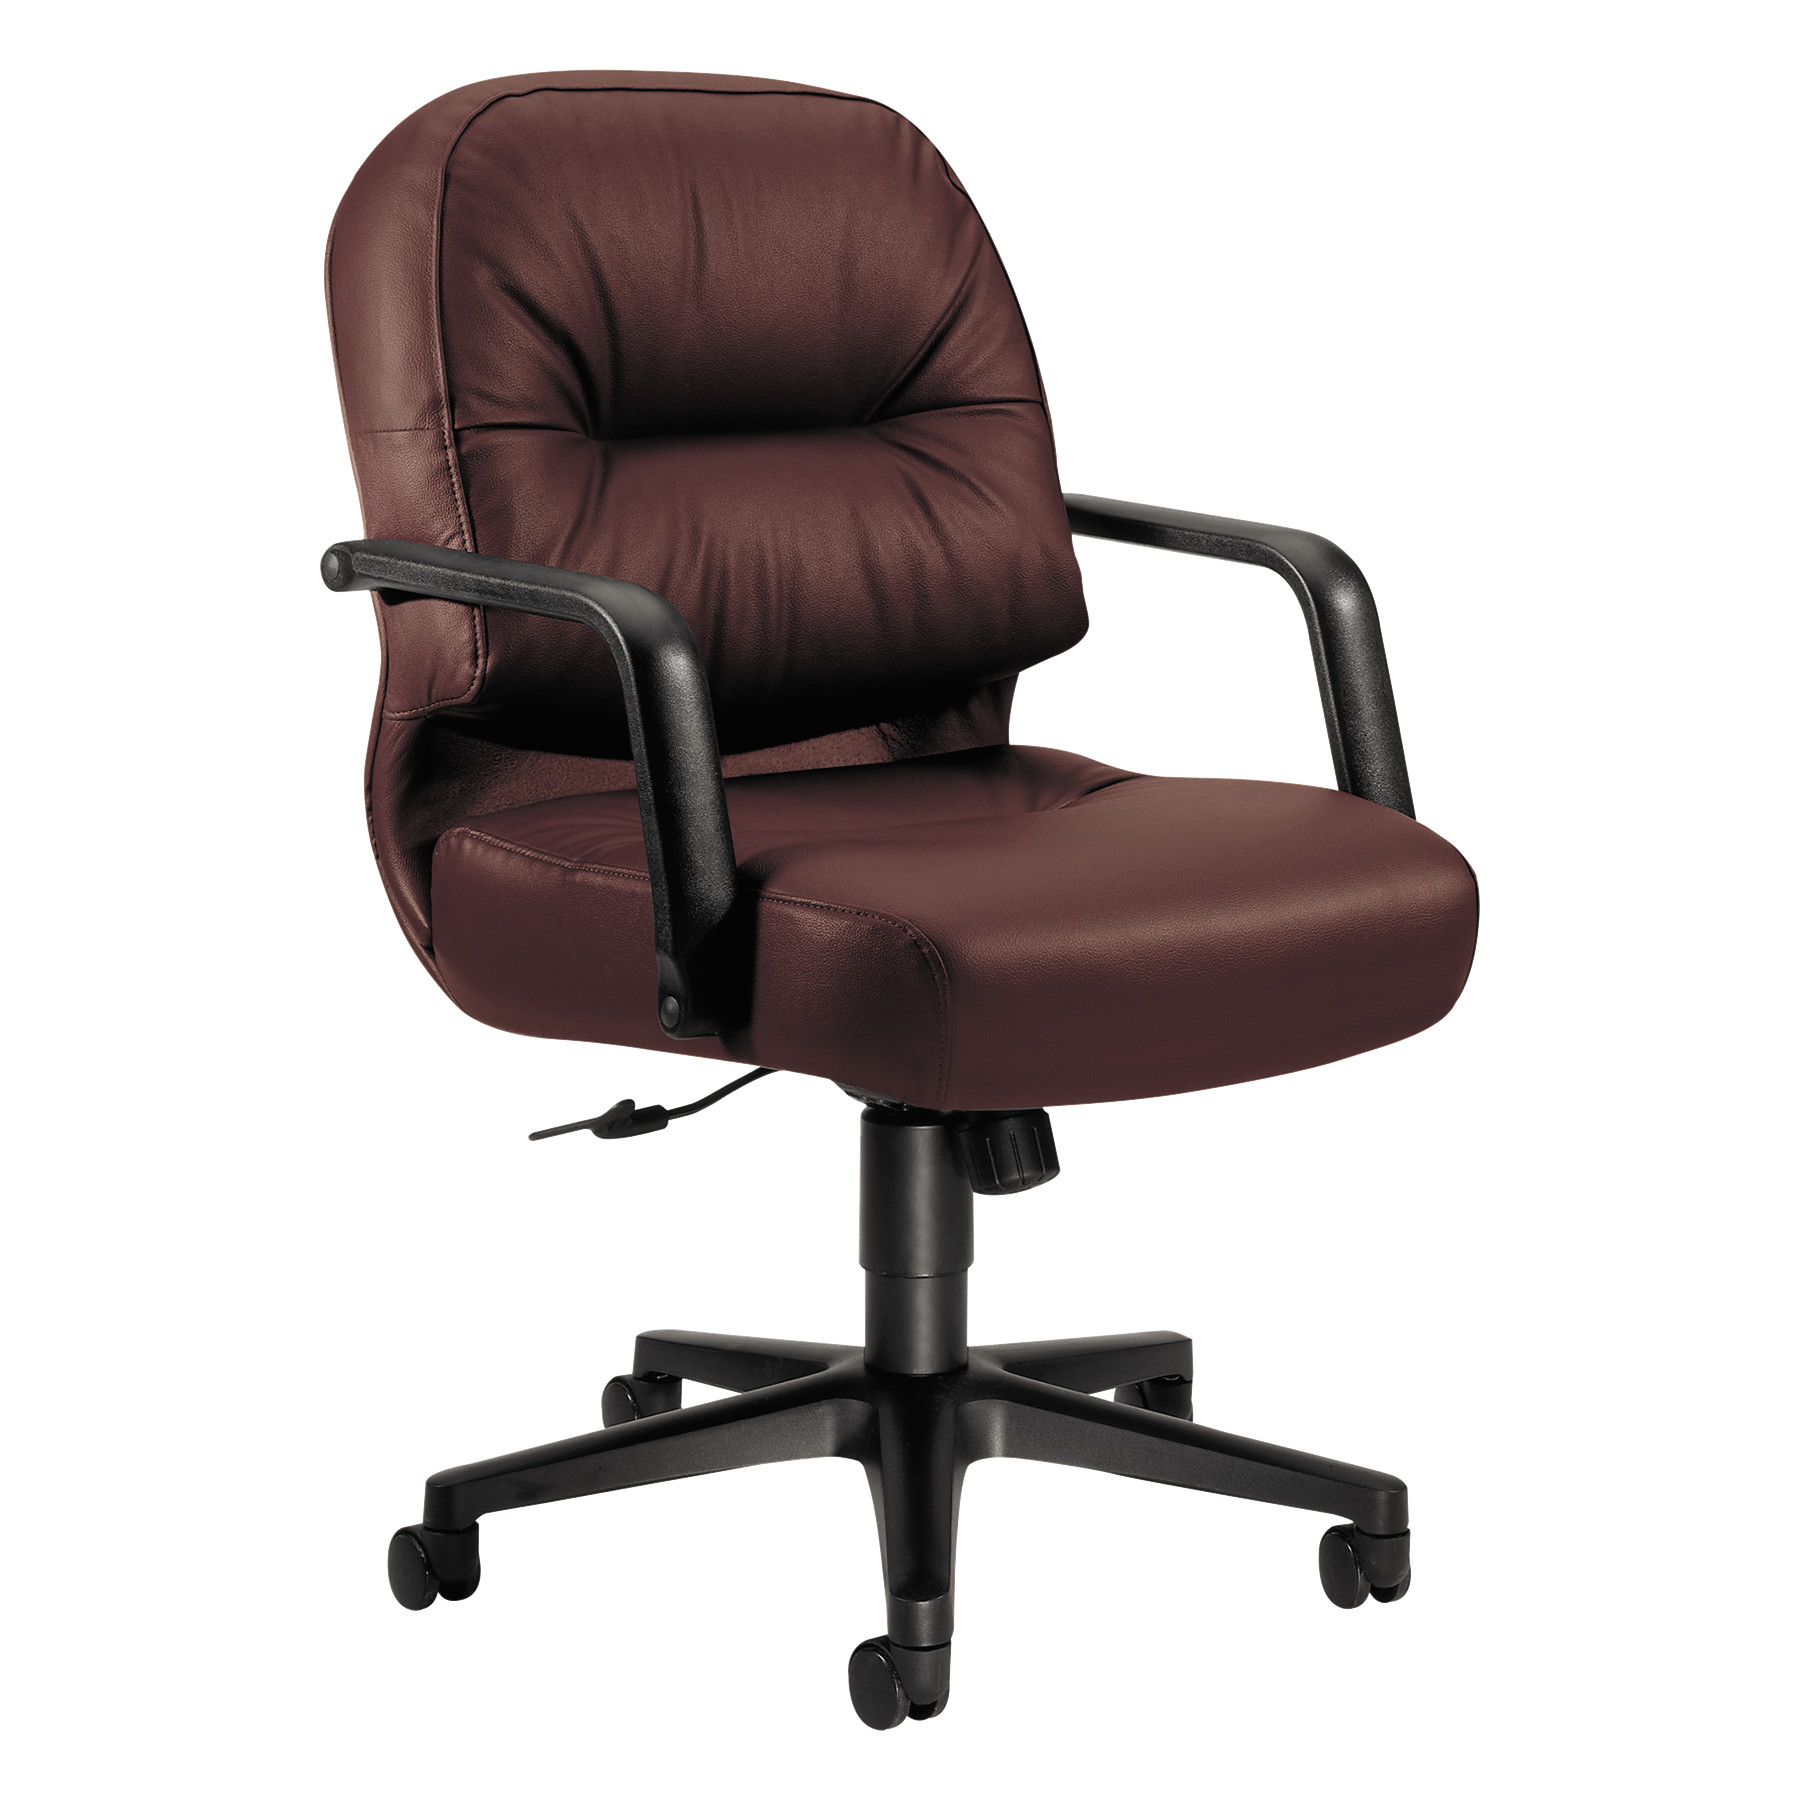 HON 2090 Pillow-Soft Series Managerial Leather Mid-Back Swivel/Tilt Chair, Black